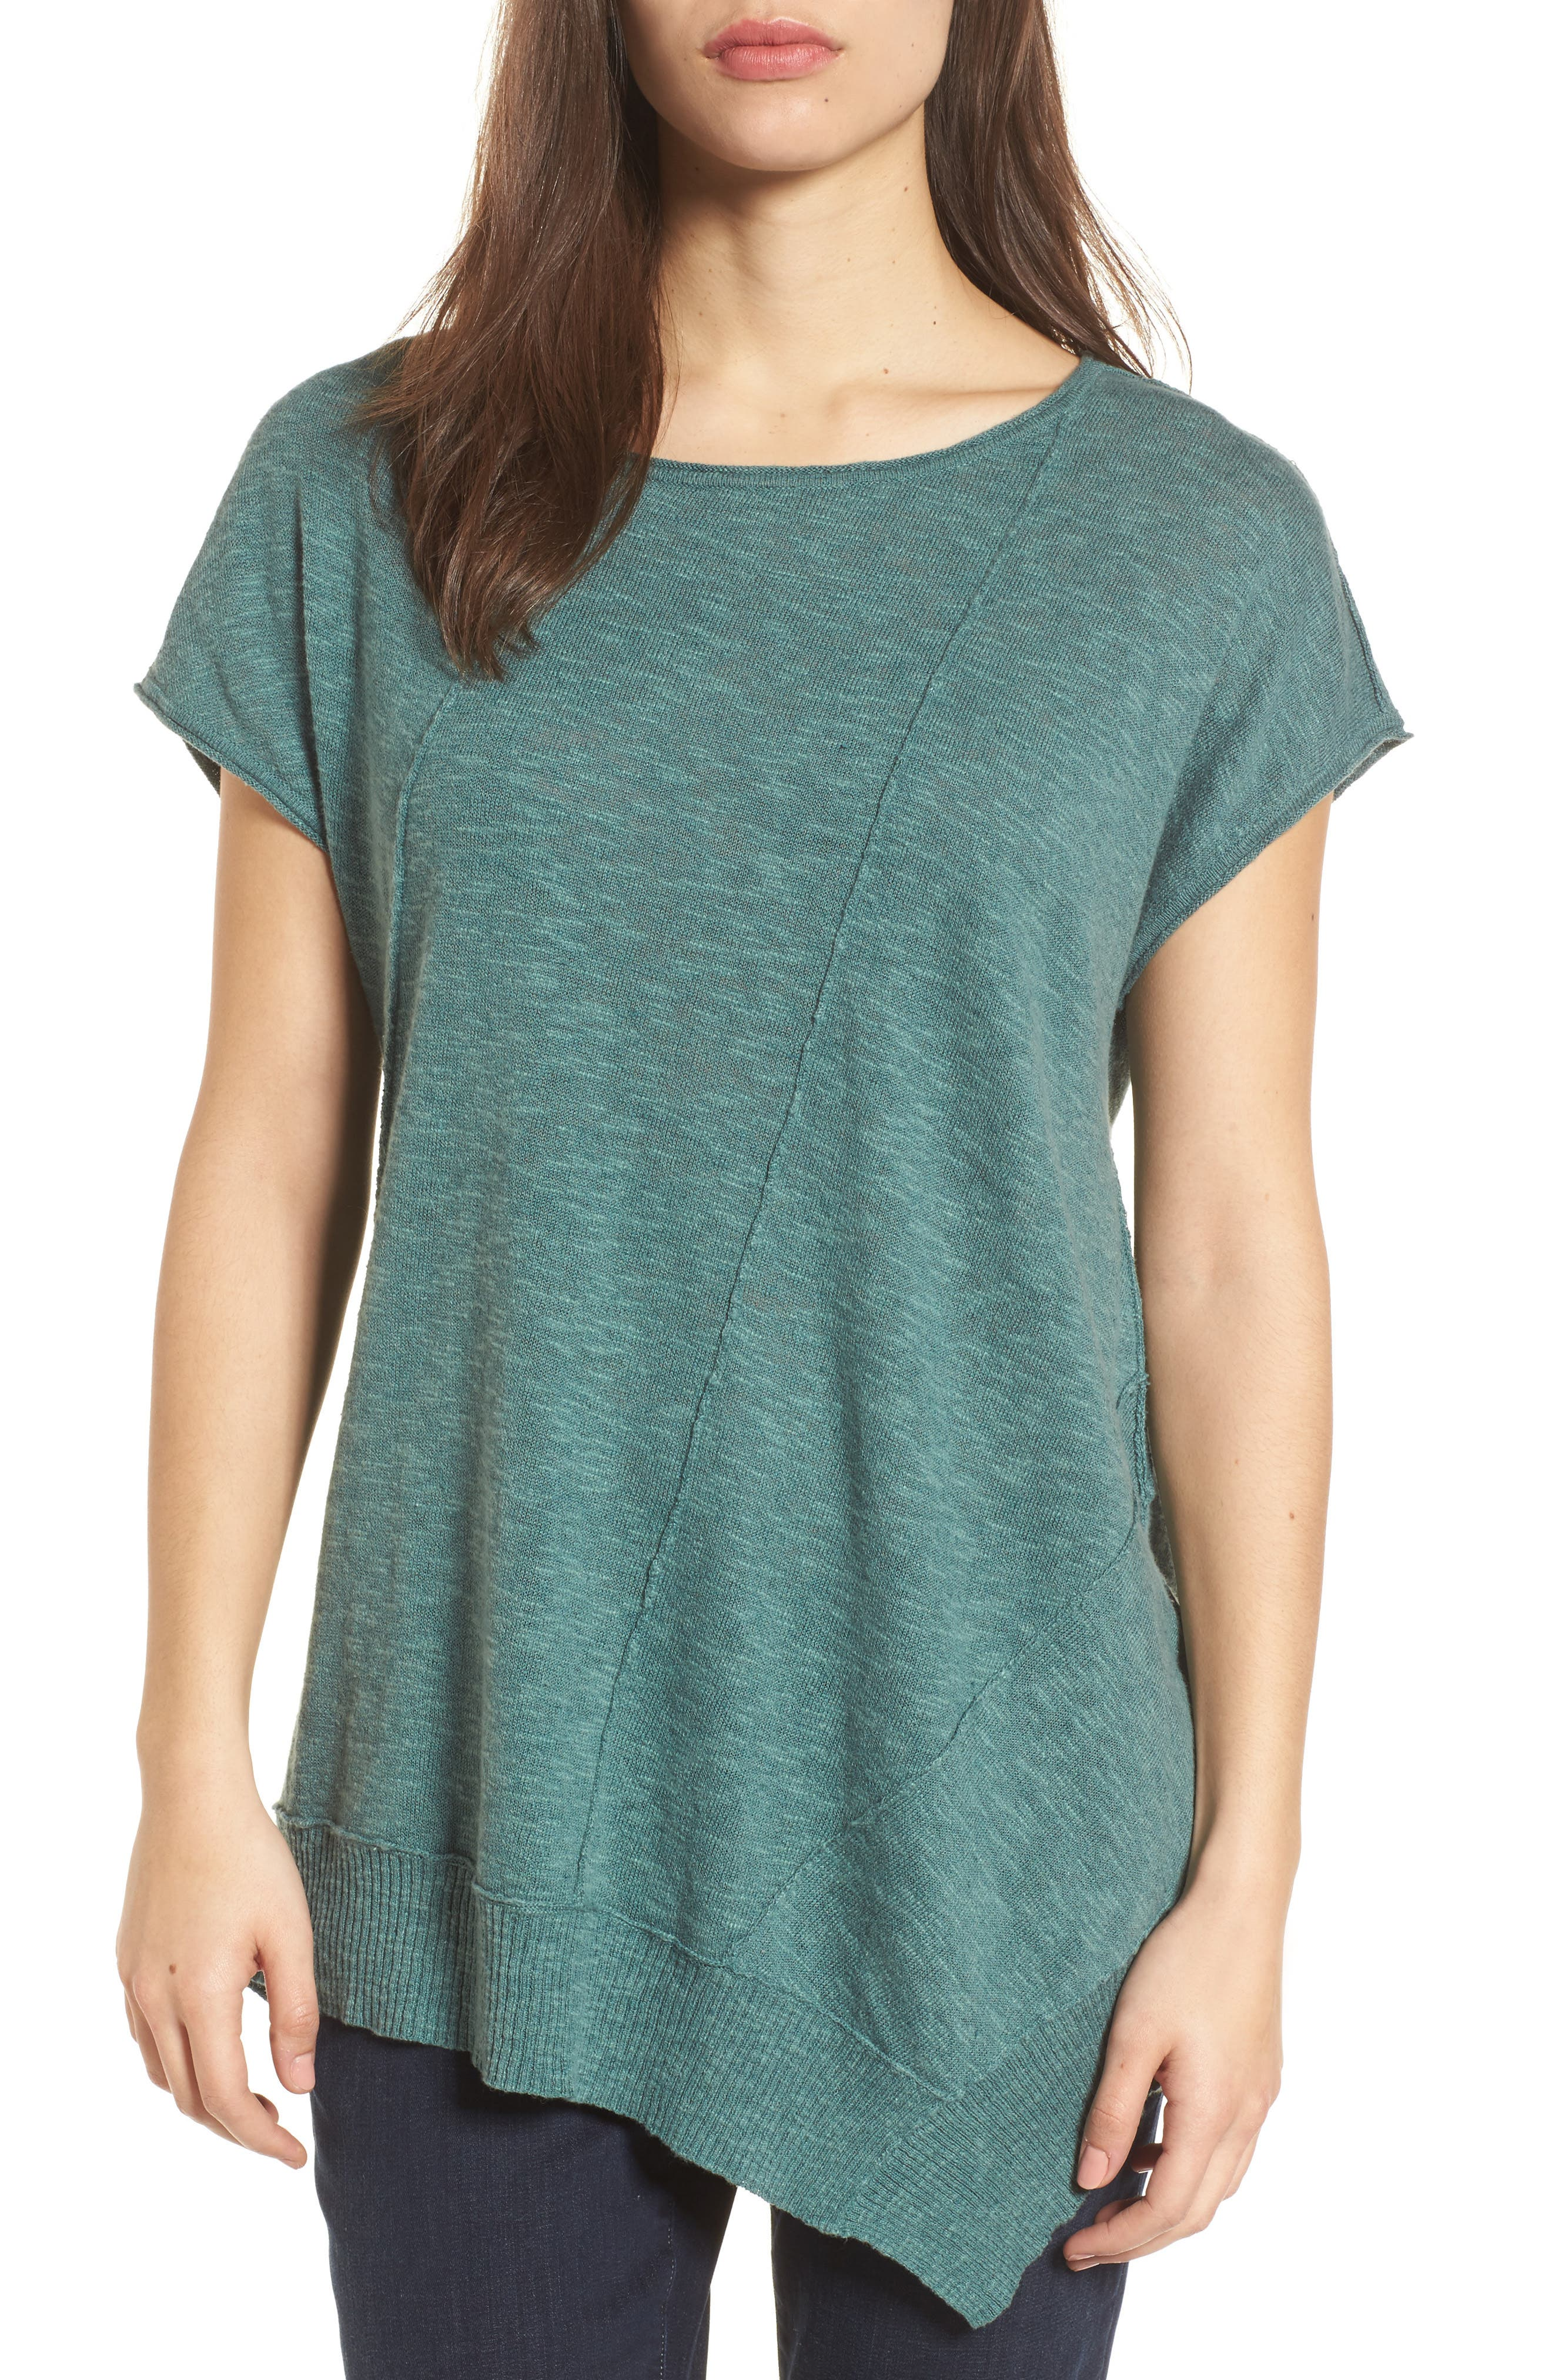 Cap Sleeve Organic Linen & Cotton Scoop Neck Top,                             Main thumbnail 1, color,                             Teal